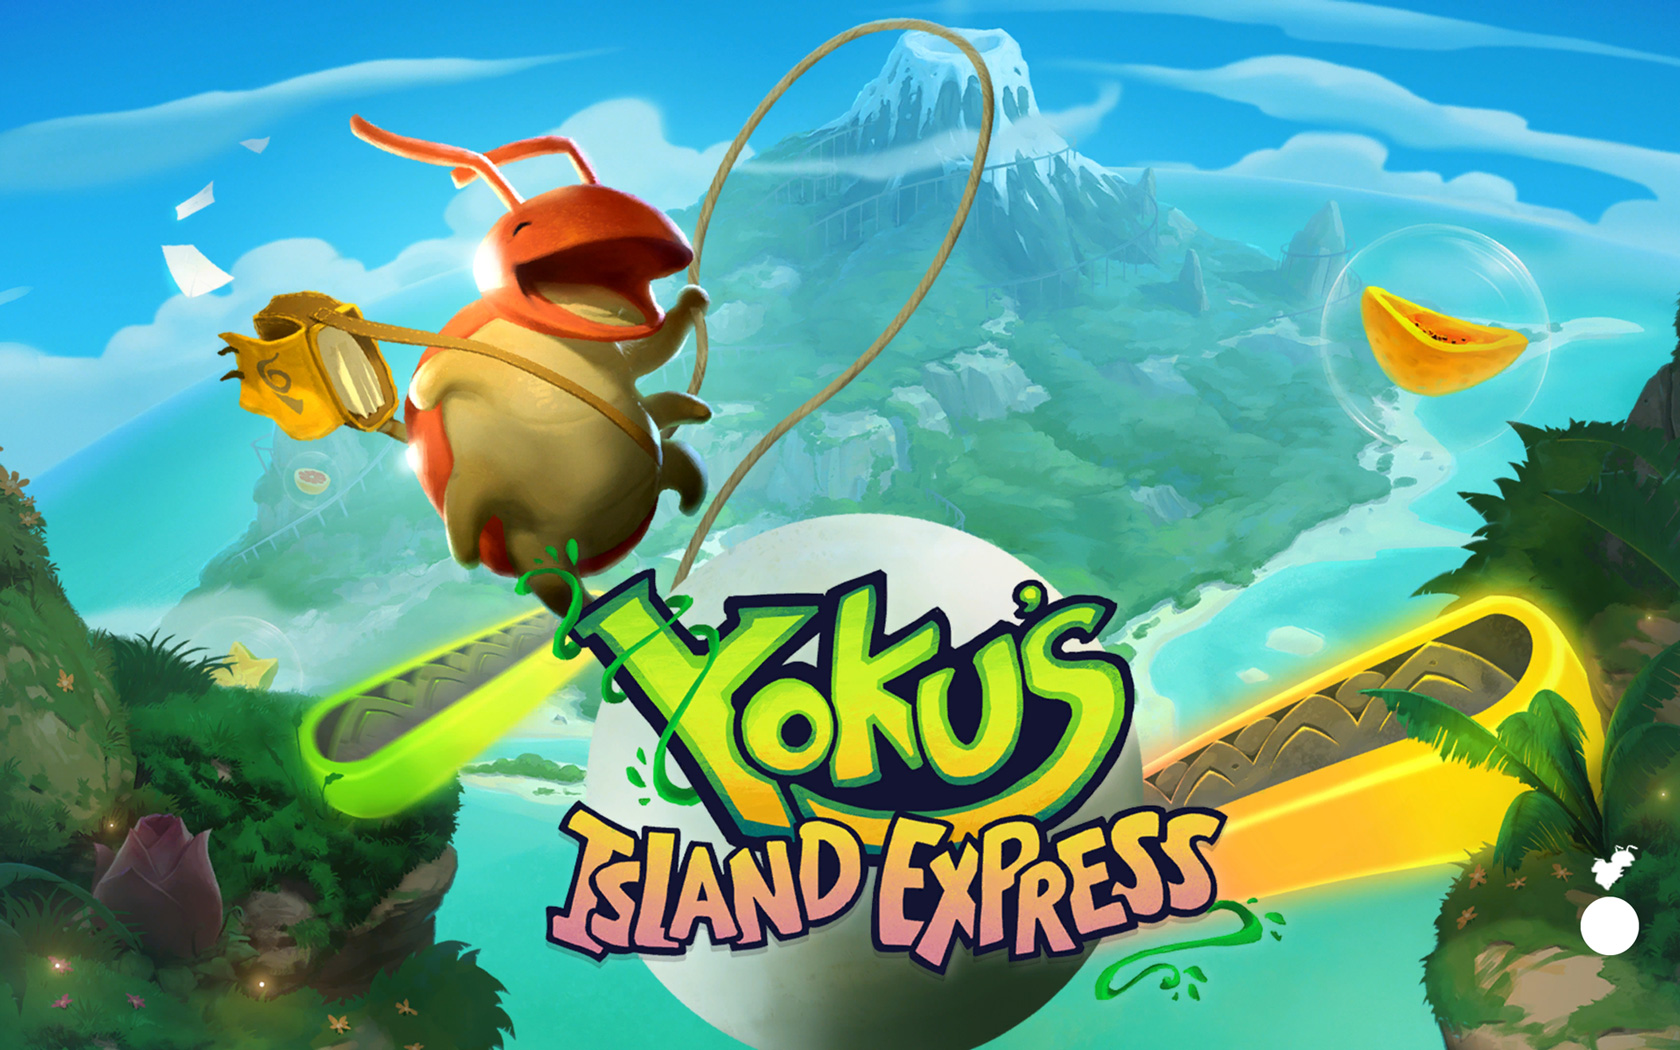 Free Yoku's Island Express Wallpaper in 1680x1050